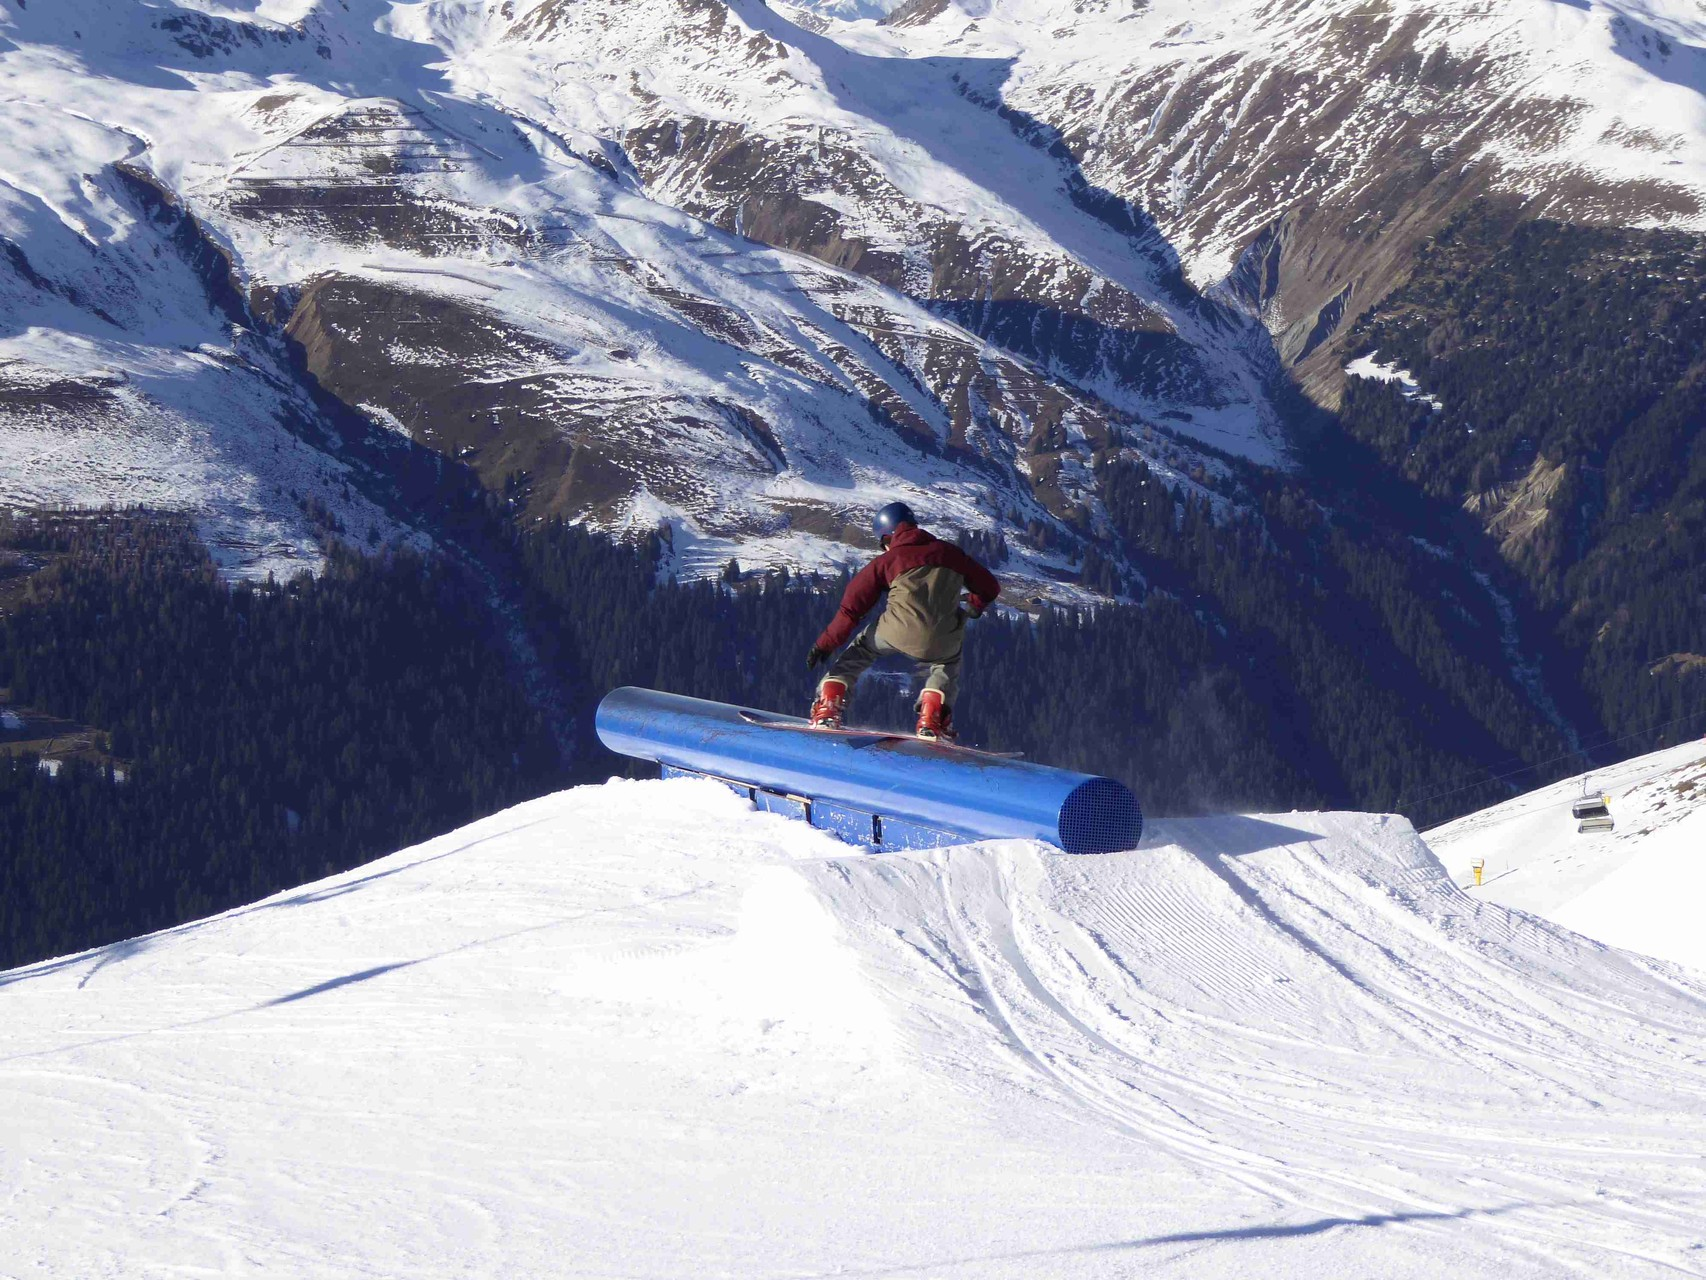 Davos Jakobshorn, Snowpark Jatz, 23.12.2015